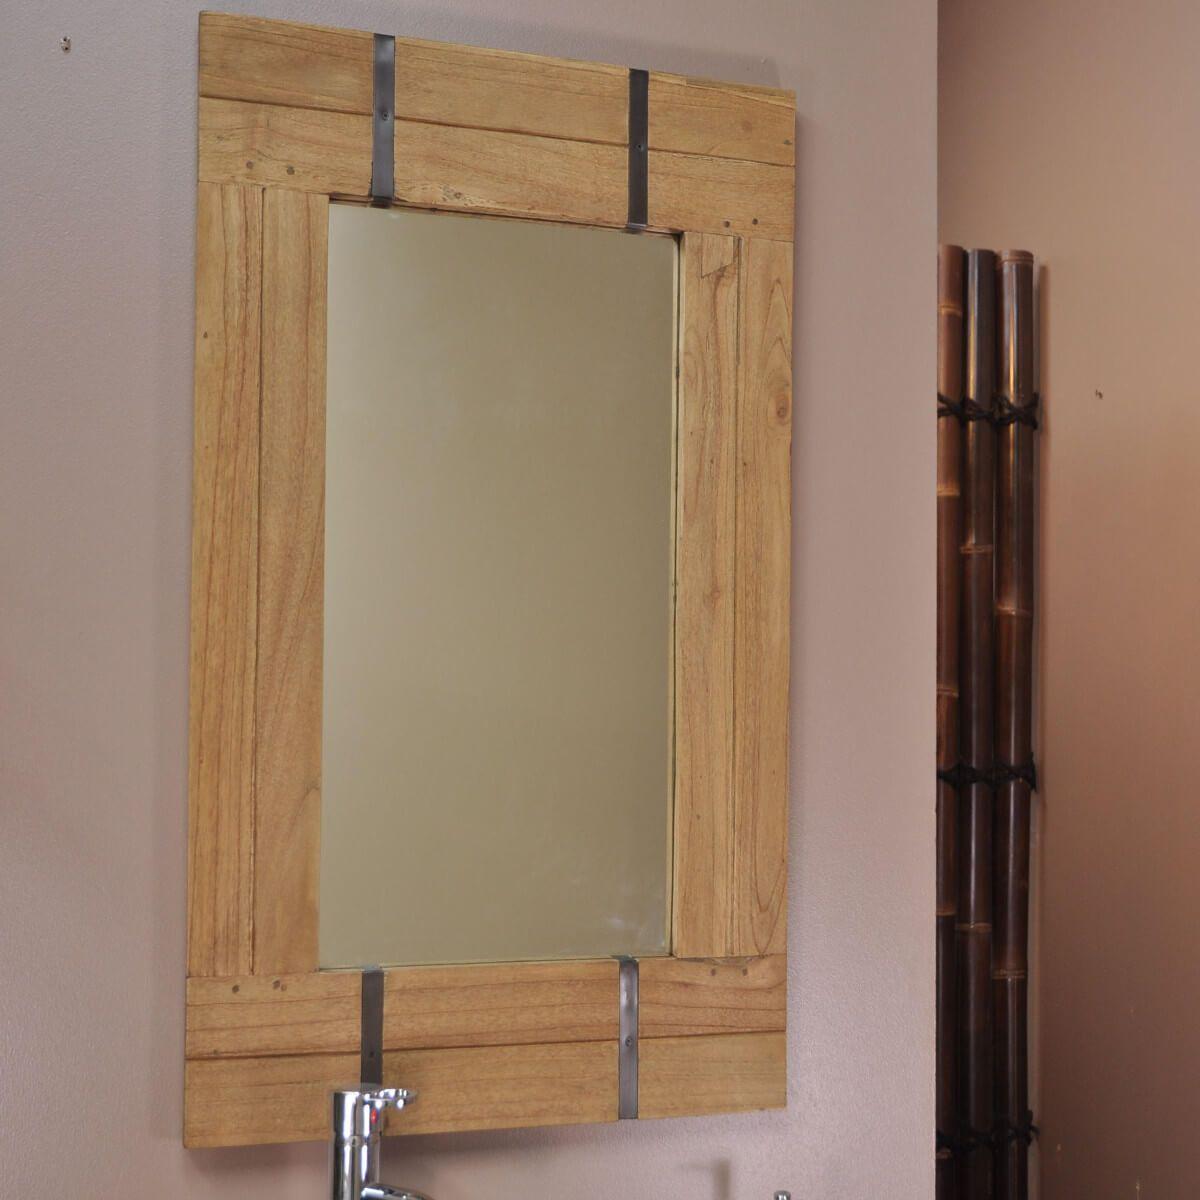 Magasin Salle De Bain Lille ~ miroir de salle de bain naturel loft 60×80 naturel pinterest